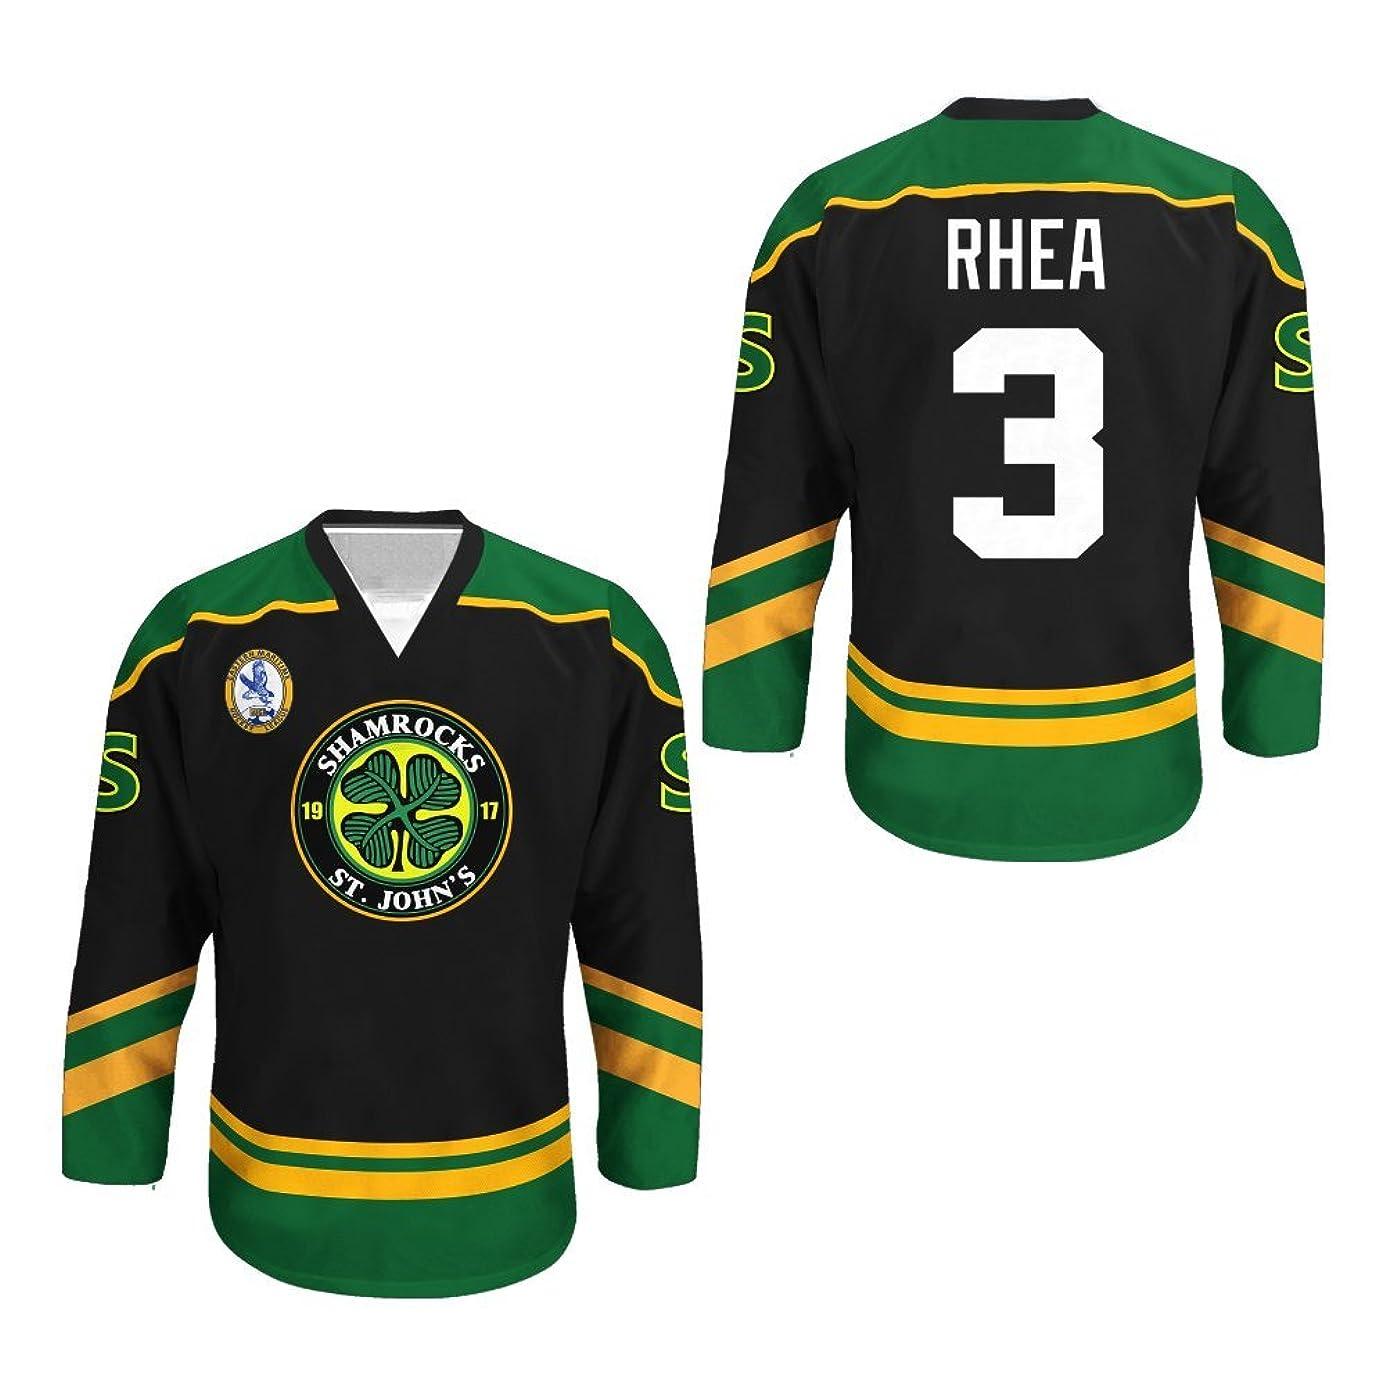 Ross The BOSS Rhea ST John's Shamrocks Hockey Jersey with EMHL Patch Stitch